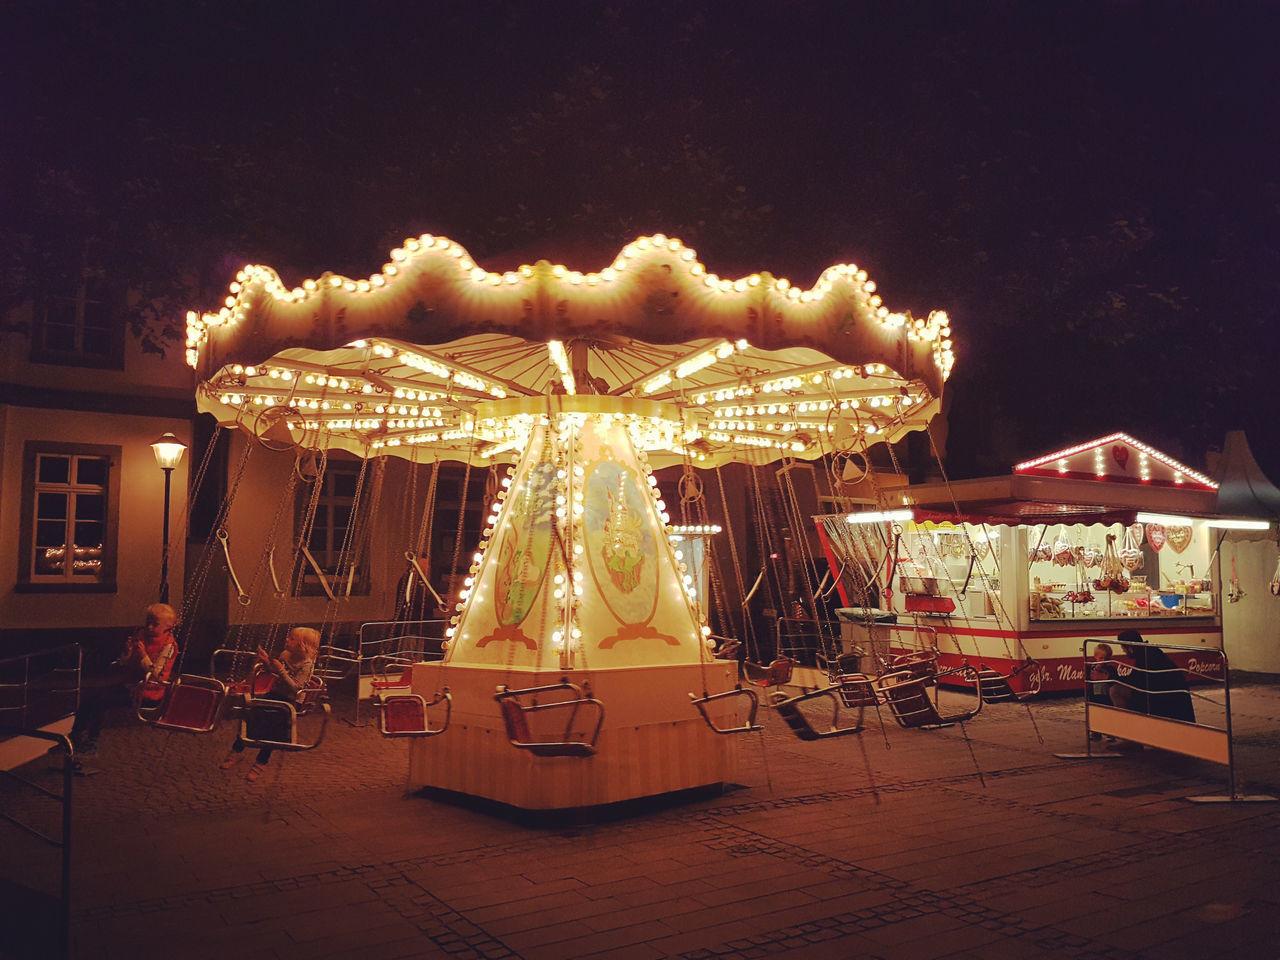 arts culture and entertainment, amusement park, night, illuminated, carousel, enjoyment, amusement park ride, chair, outdoors, fun, leisure activity, no people, merry-go-round, sky